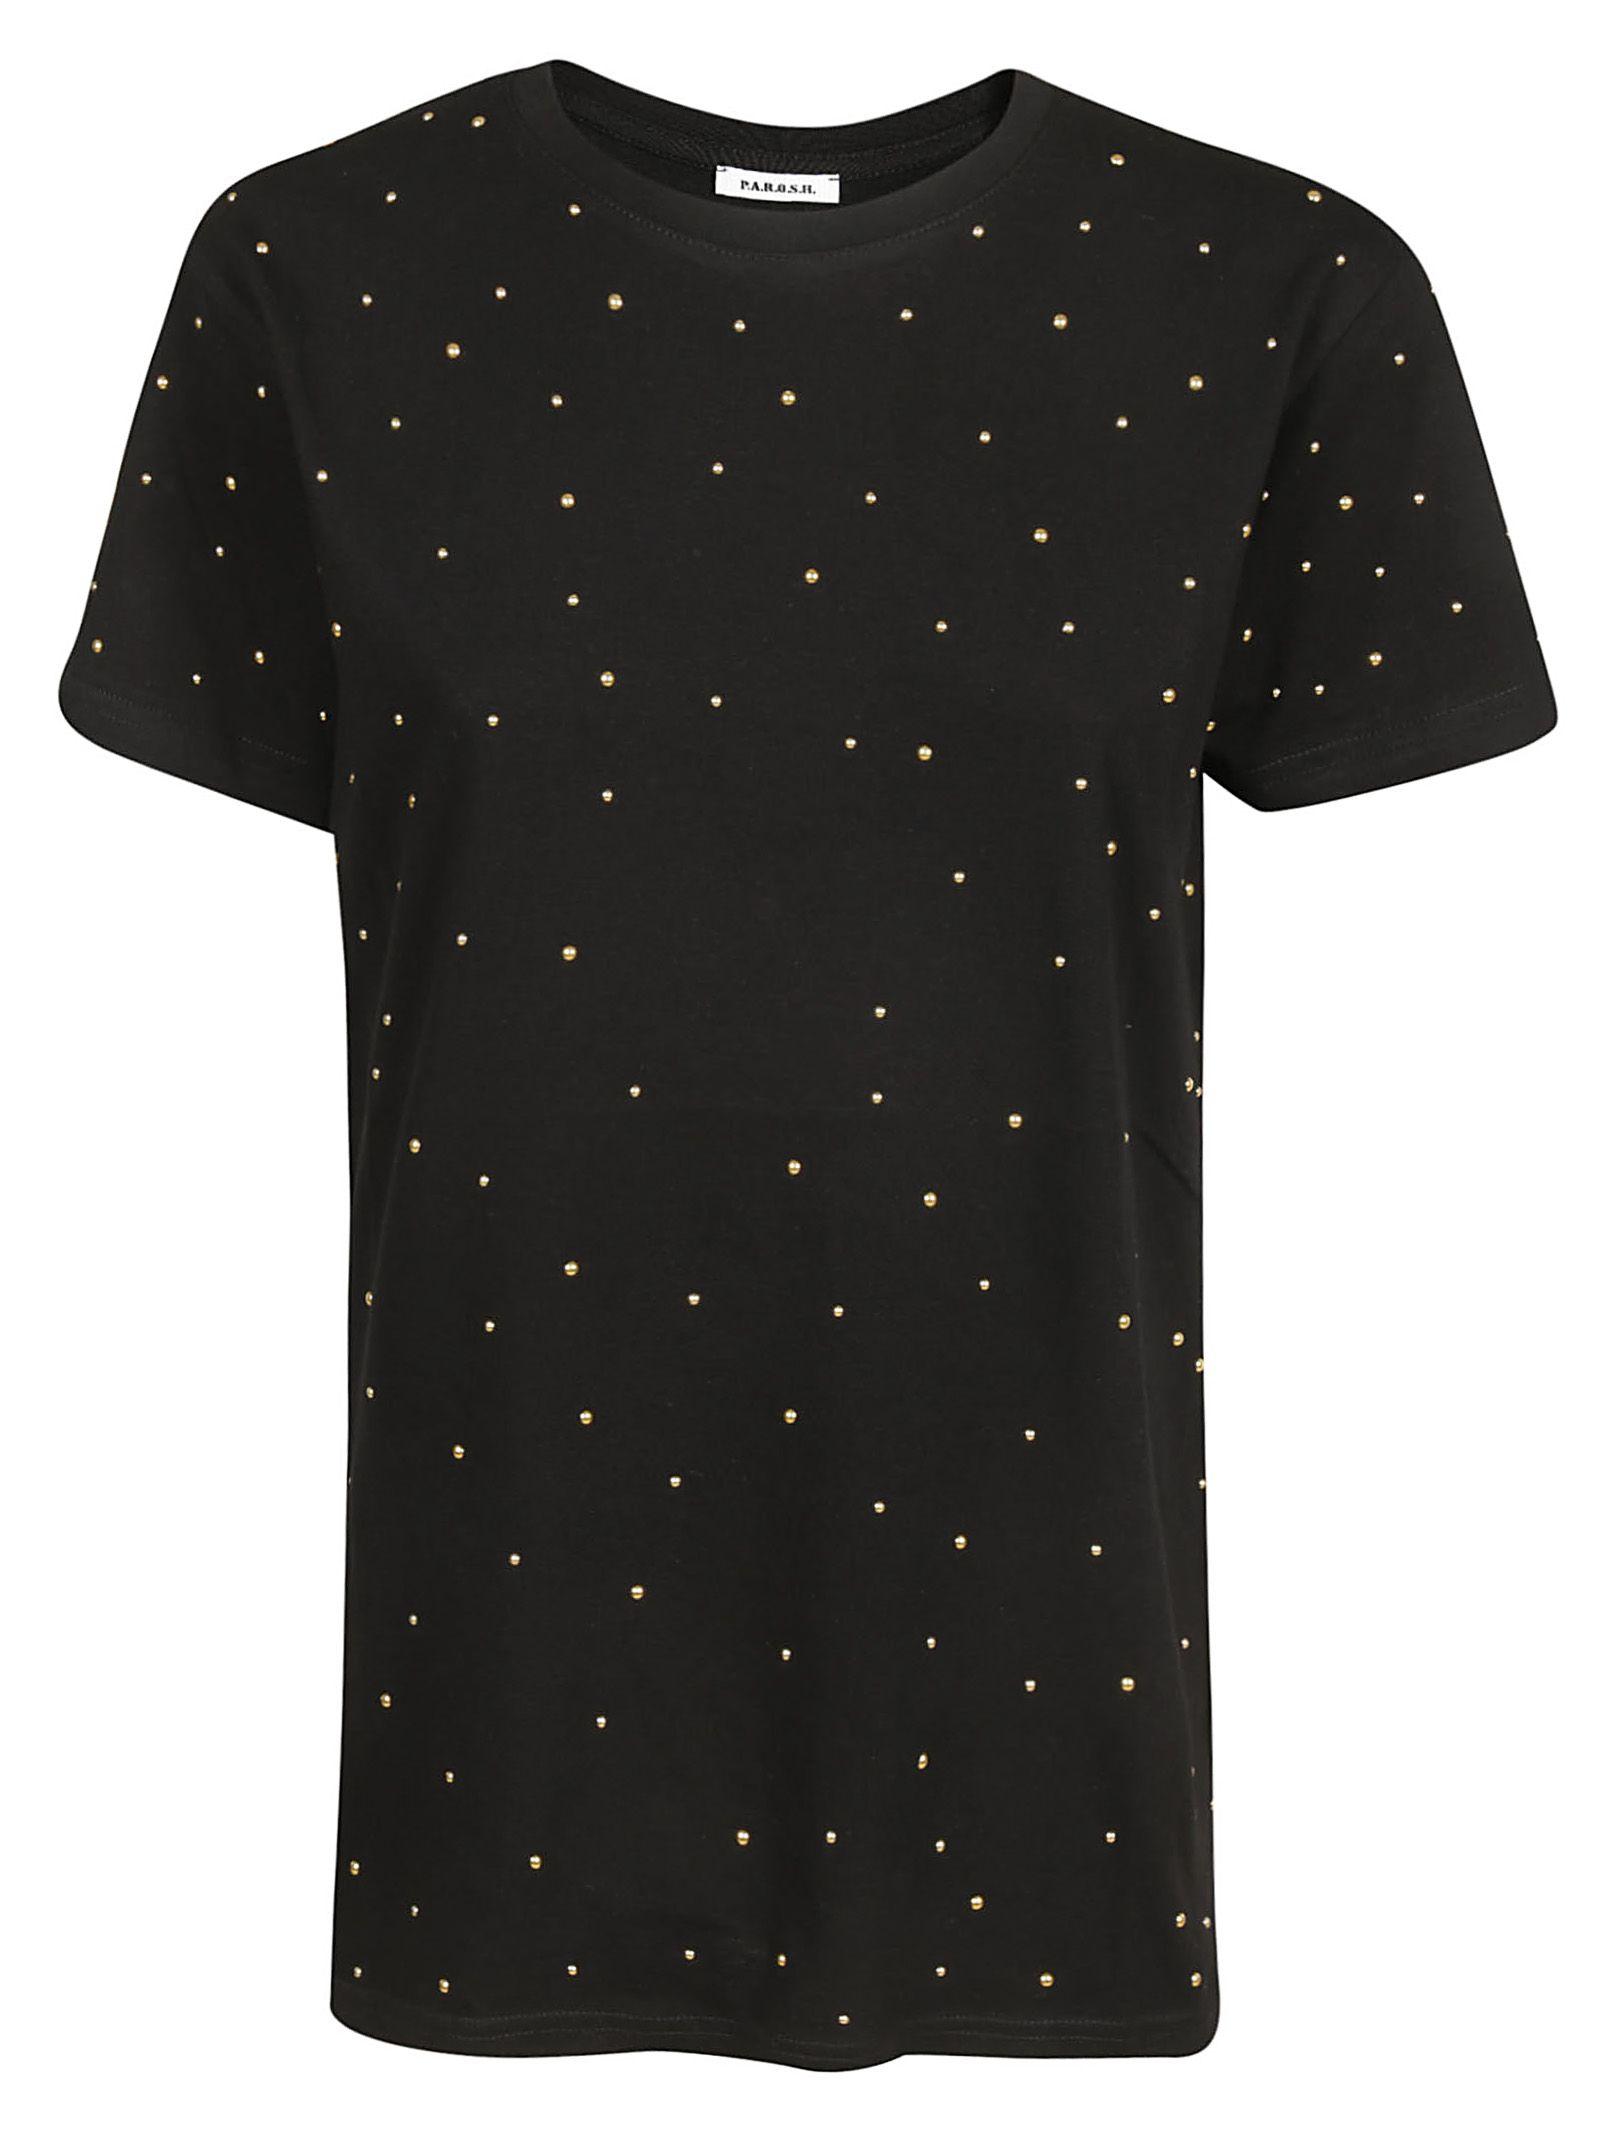 Parosh Studded T-shirt